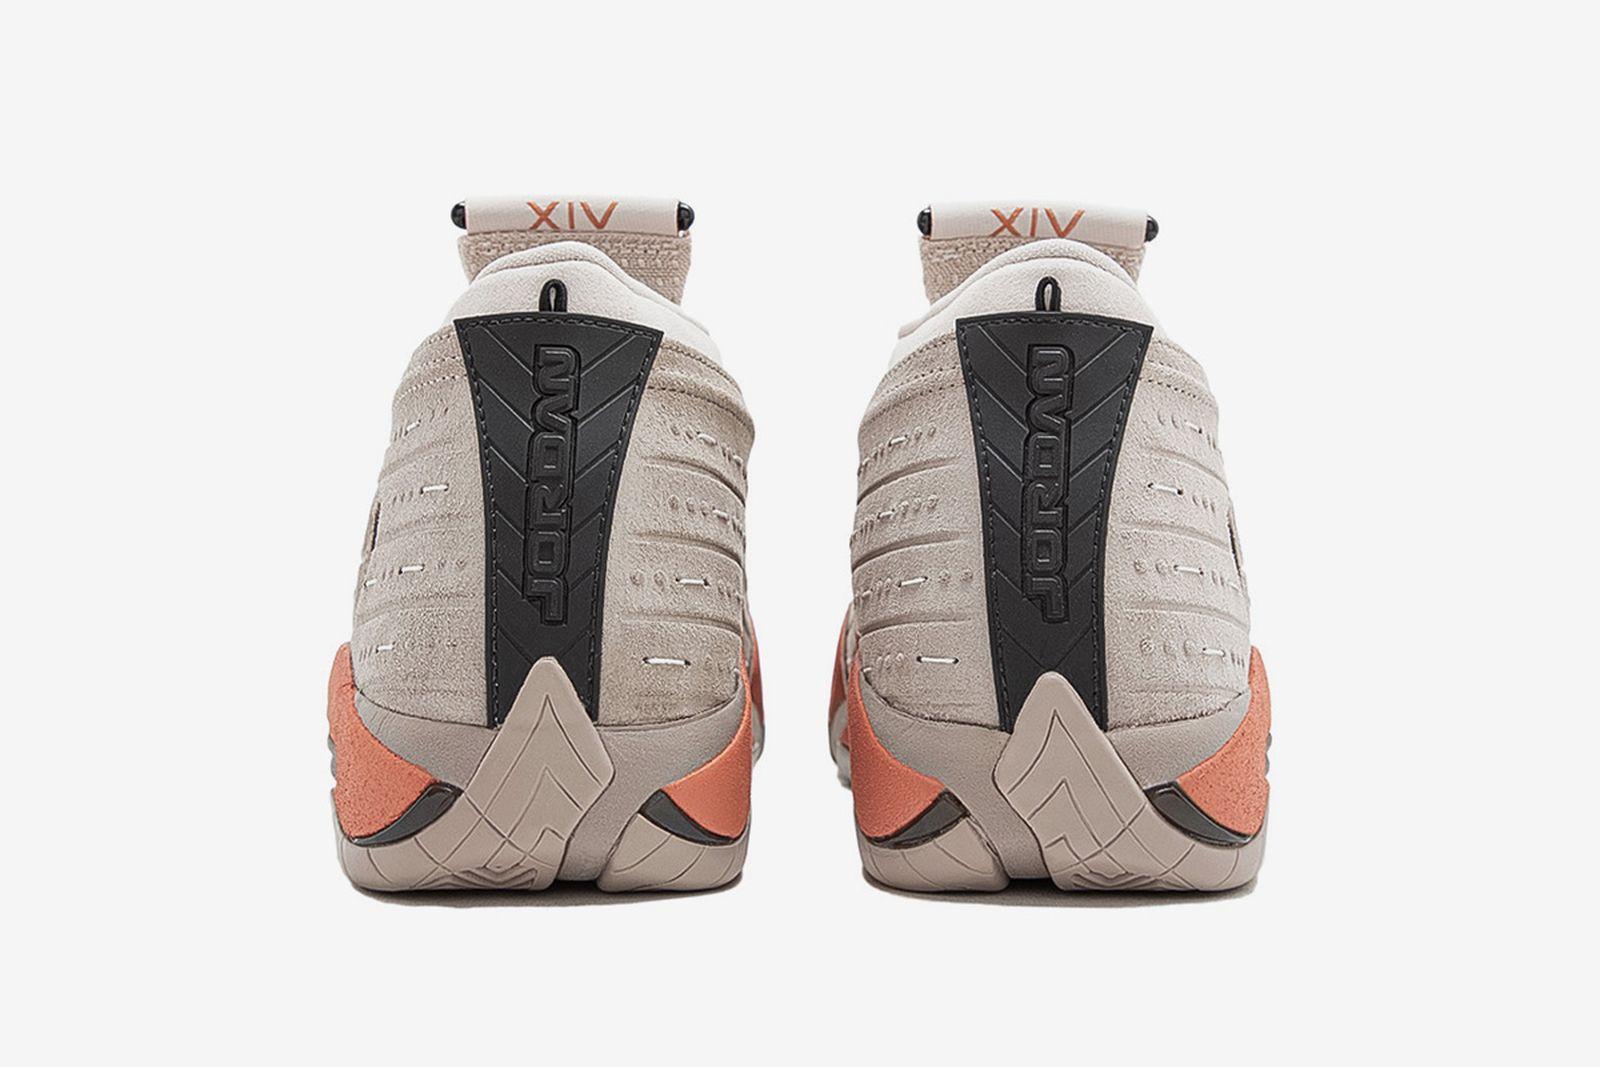 clot-air-jordan-14-low-terracotta-release-info-1-03